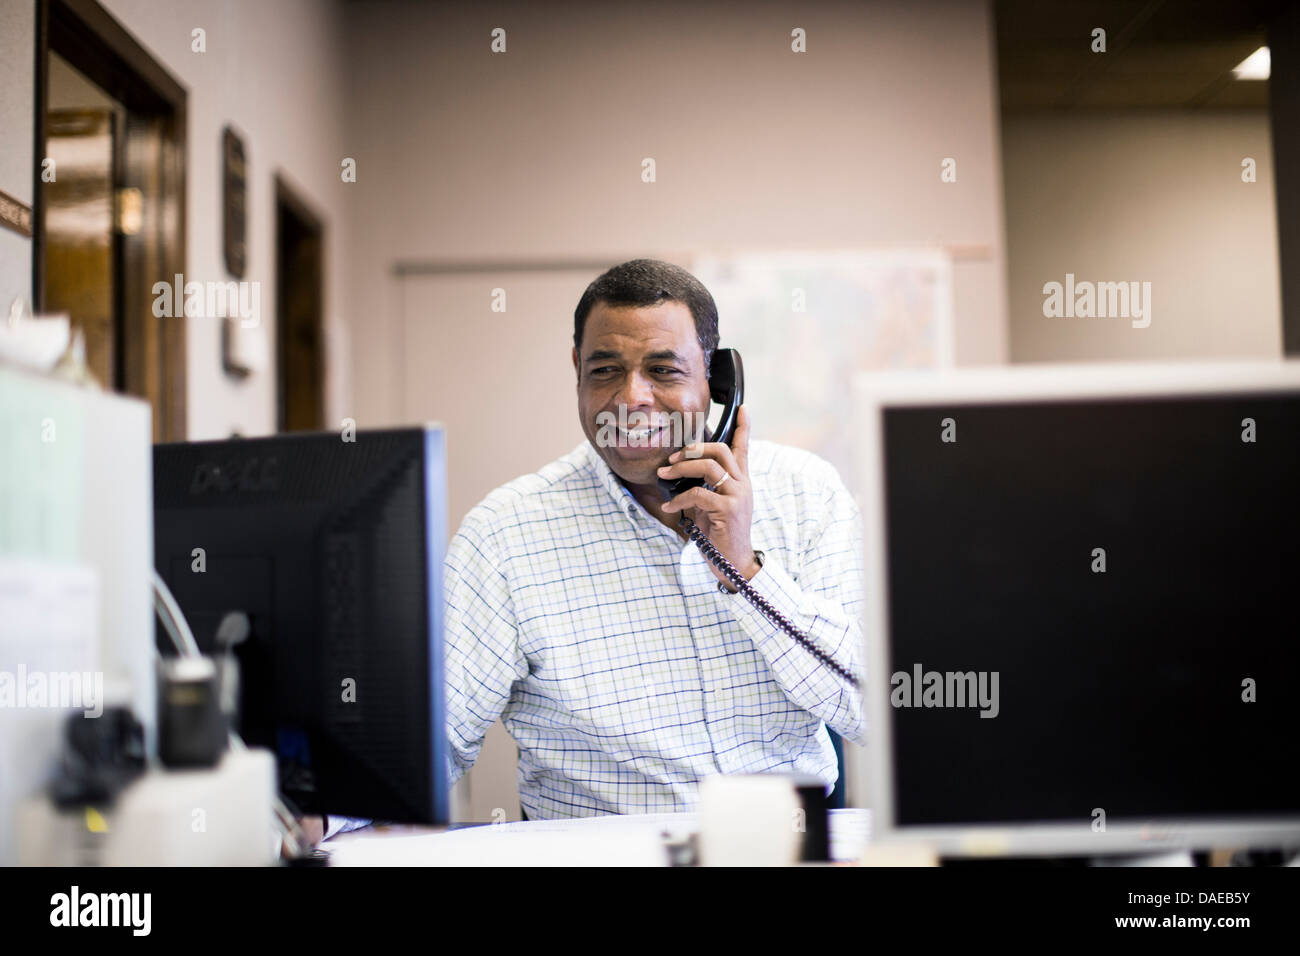 Mature man in office on landline - Stock Image